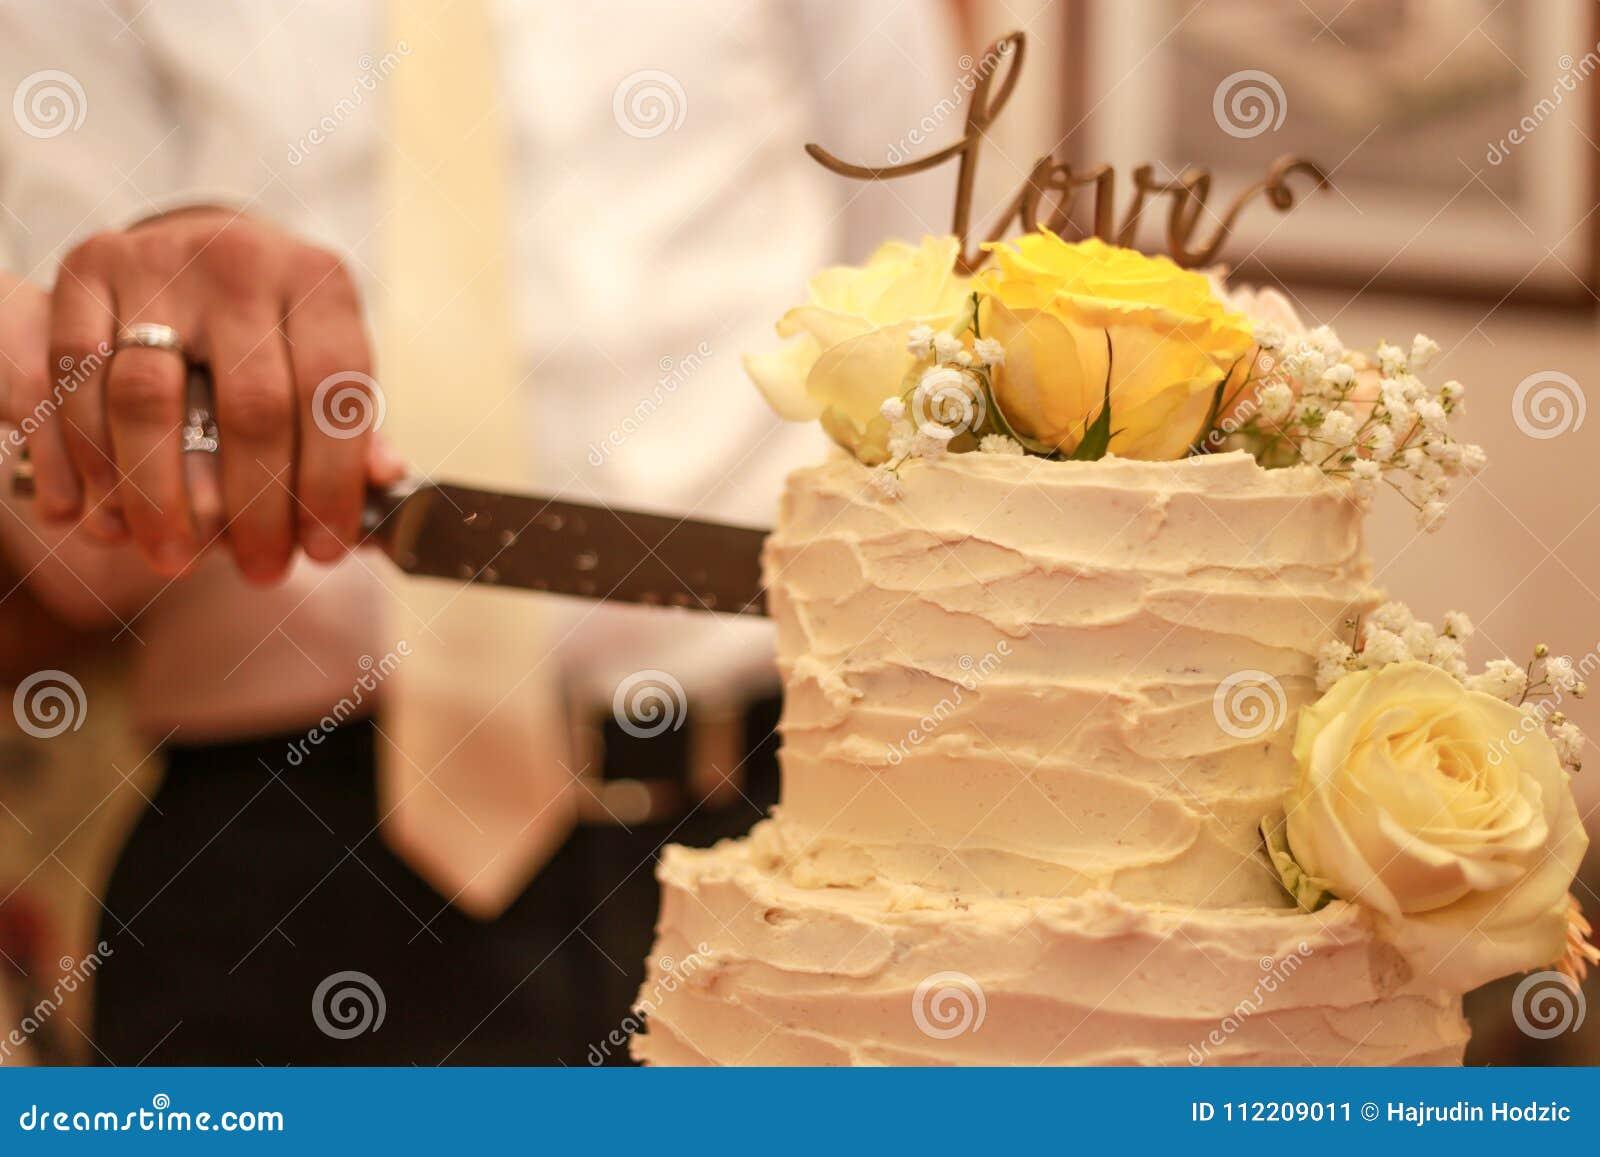 Wedding Day, Wedding Cake, Flower Decoration, Bride Cut Cake, So ...